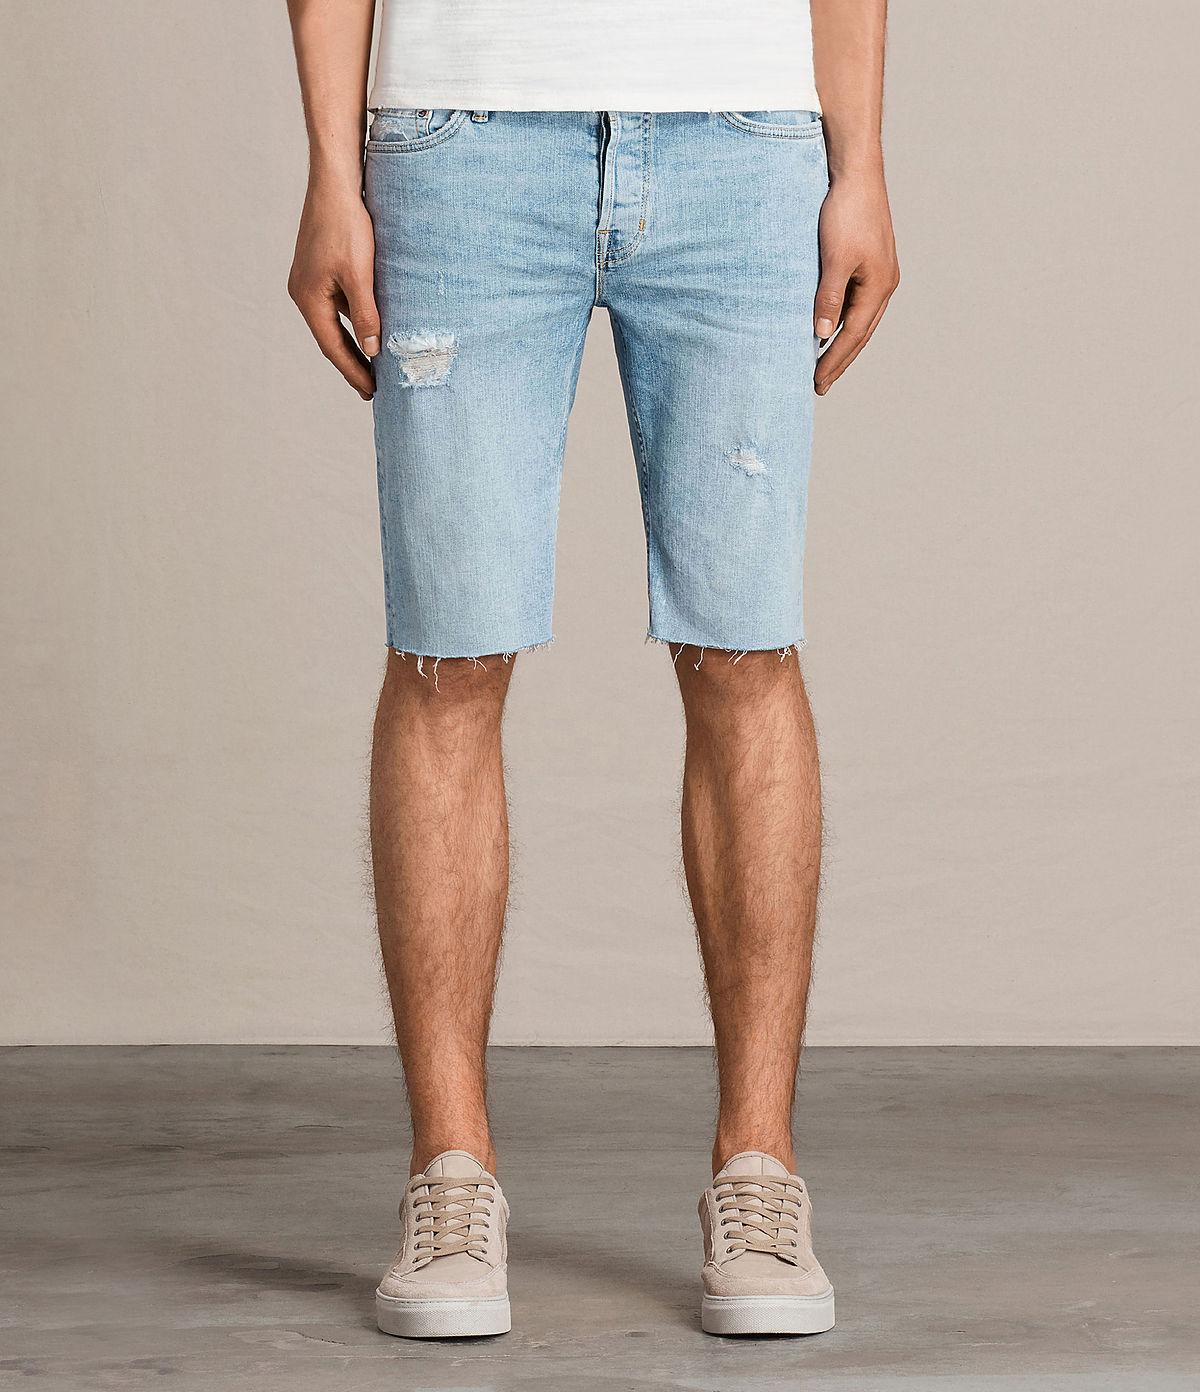 donahue-switch-denim-shorts